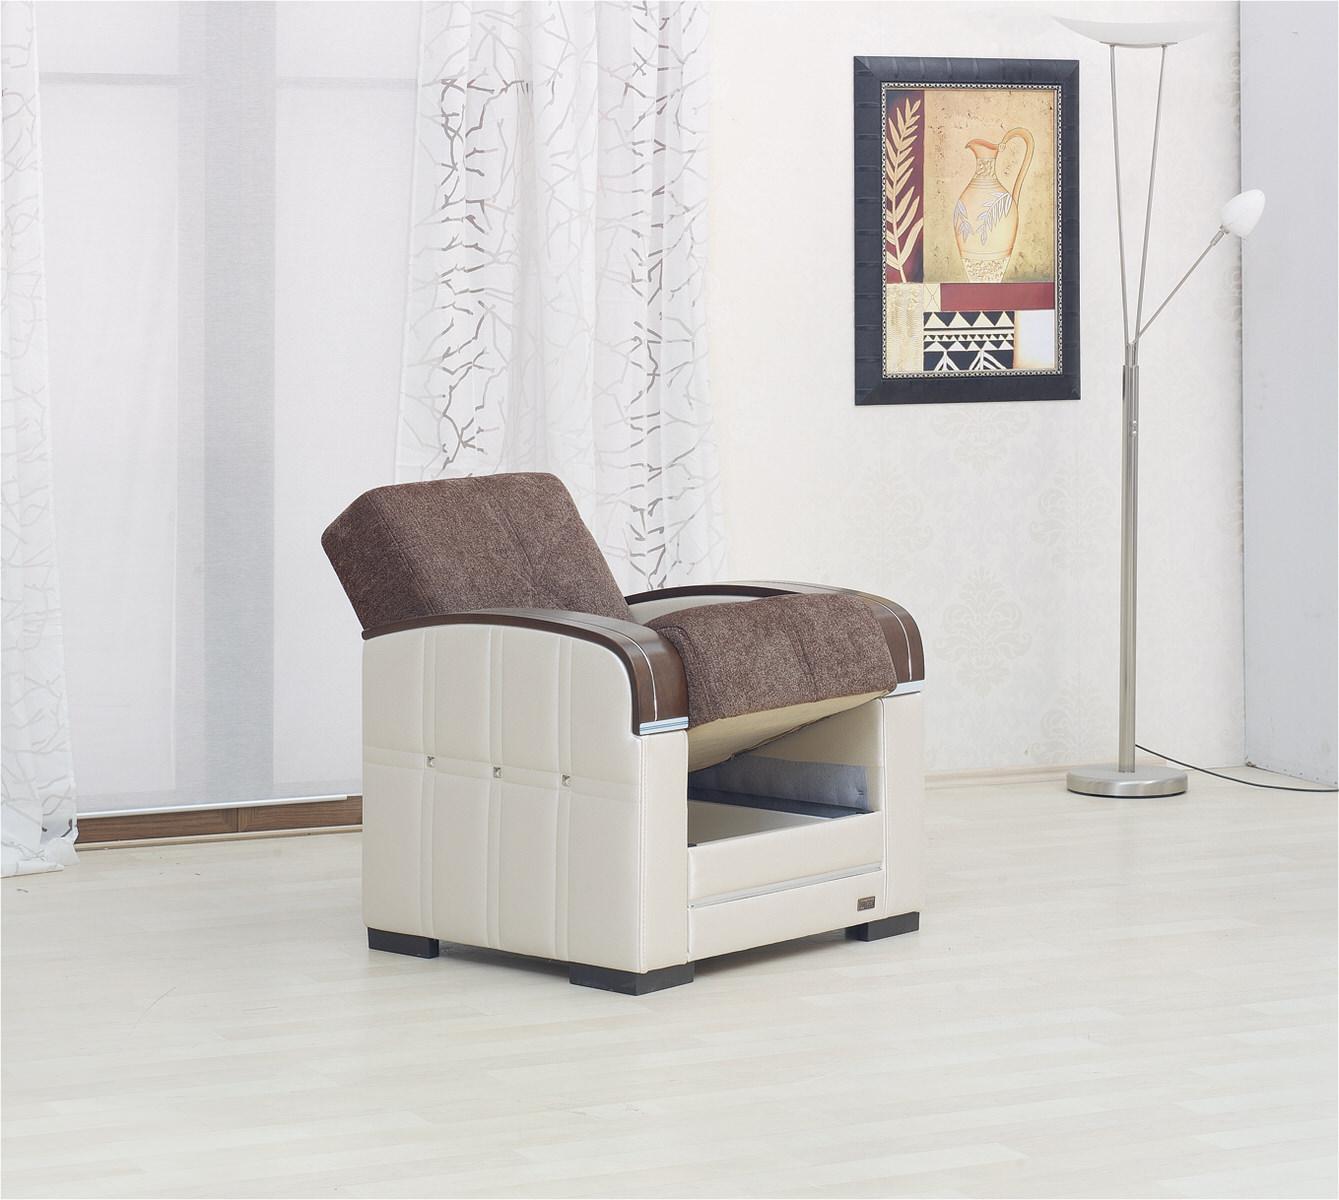 Iowa Chair by Meyan Furniture